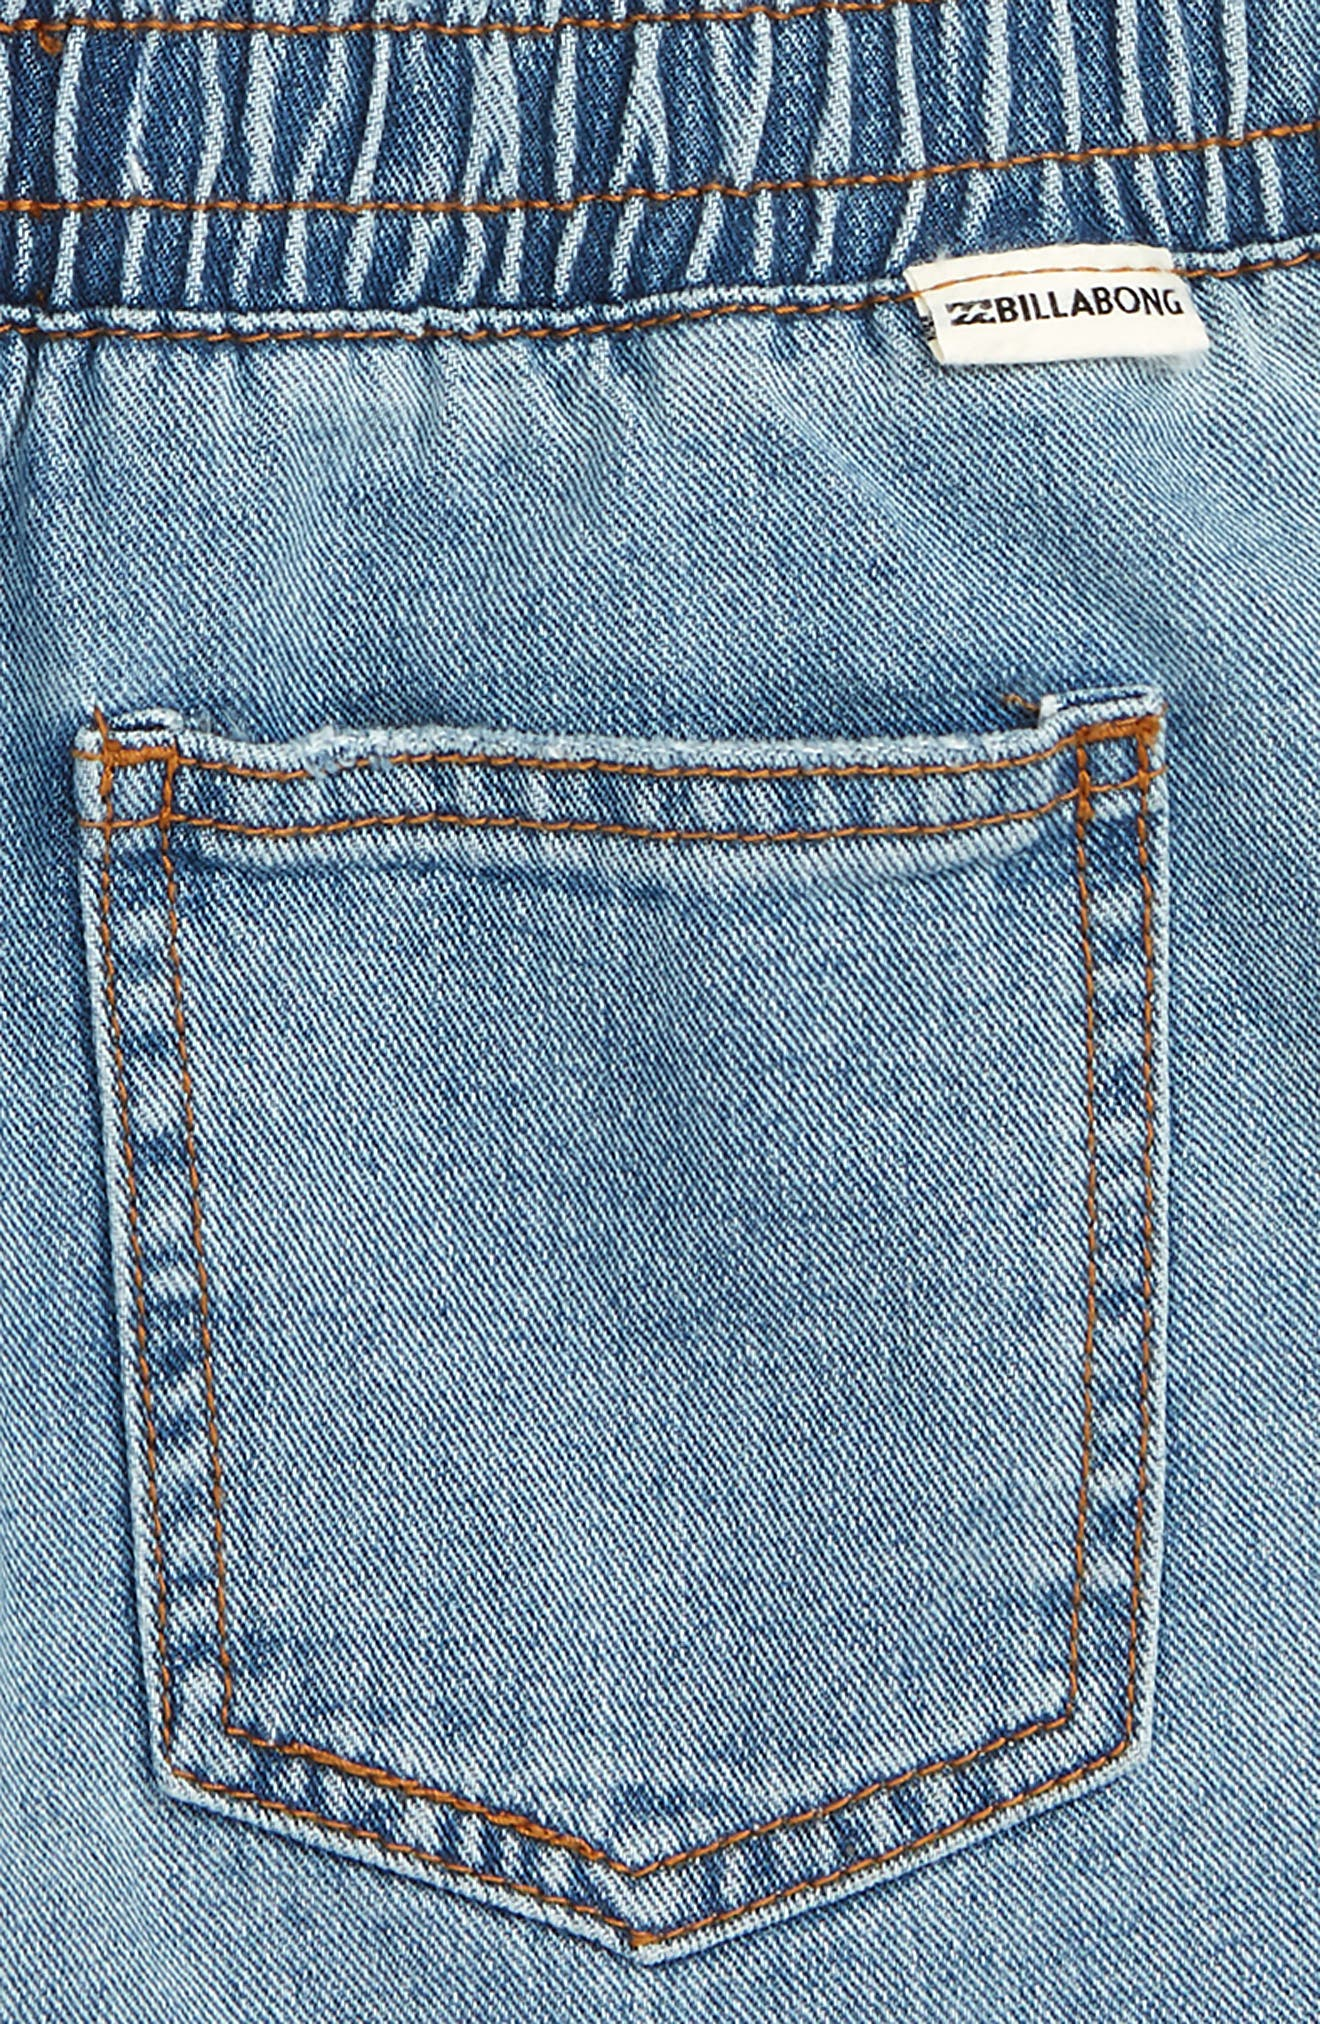 Wild Sun Cutoff Shorts,                             Alternate thumbnail 3, color,                             INDIGO